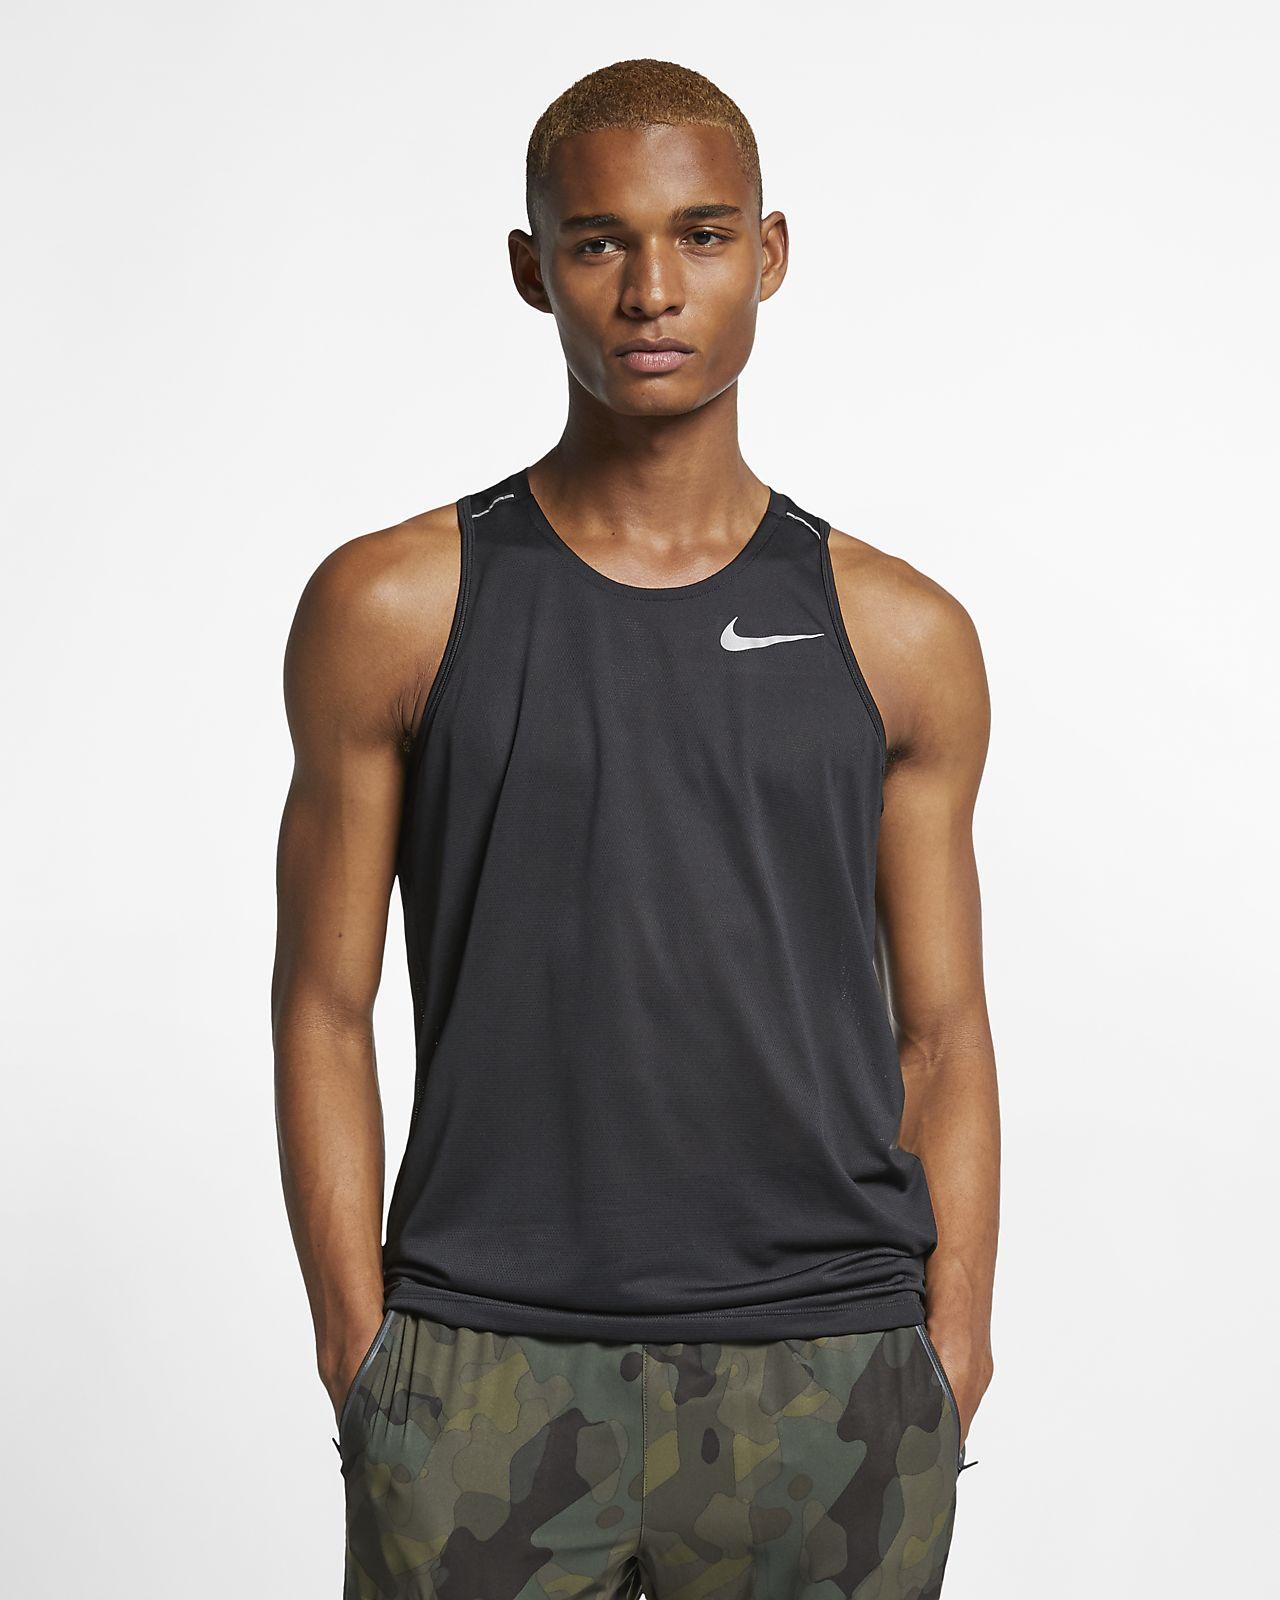 c971d3f4 Nike Dri-FIT Miler Men's Running Tank. Nike.com